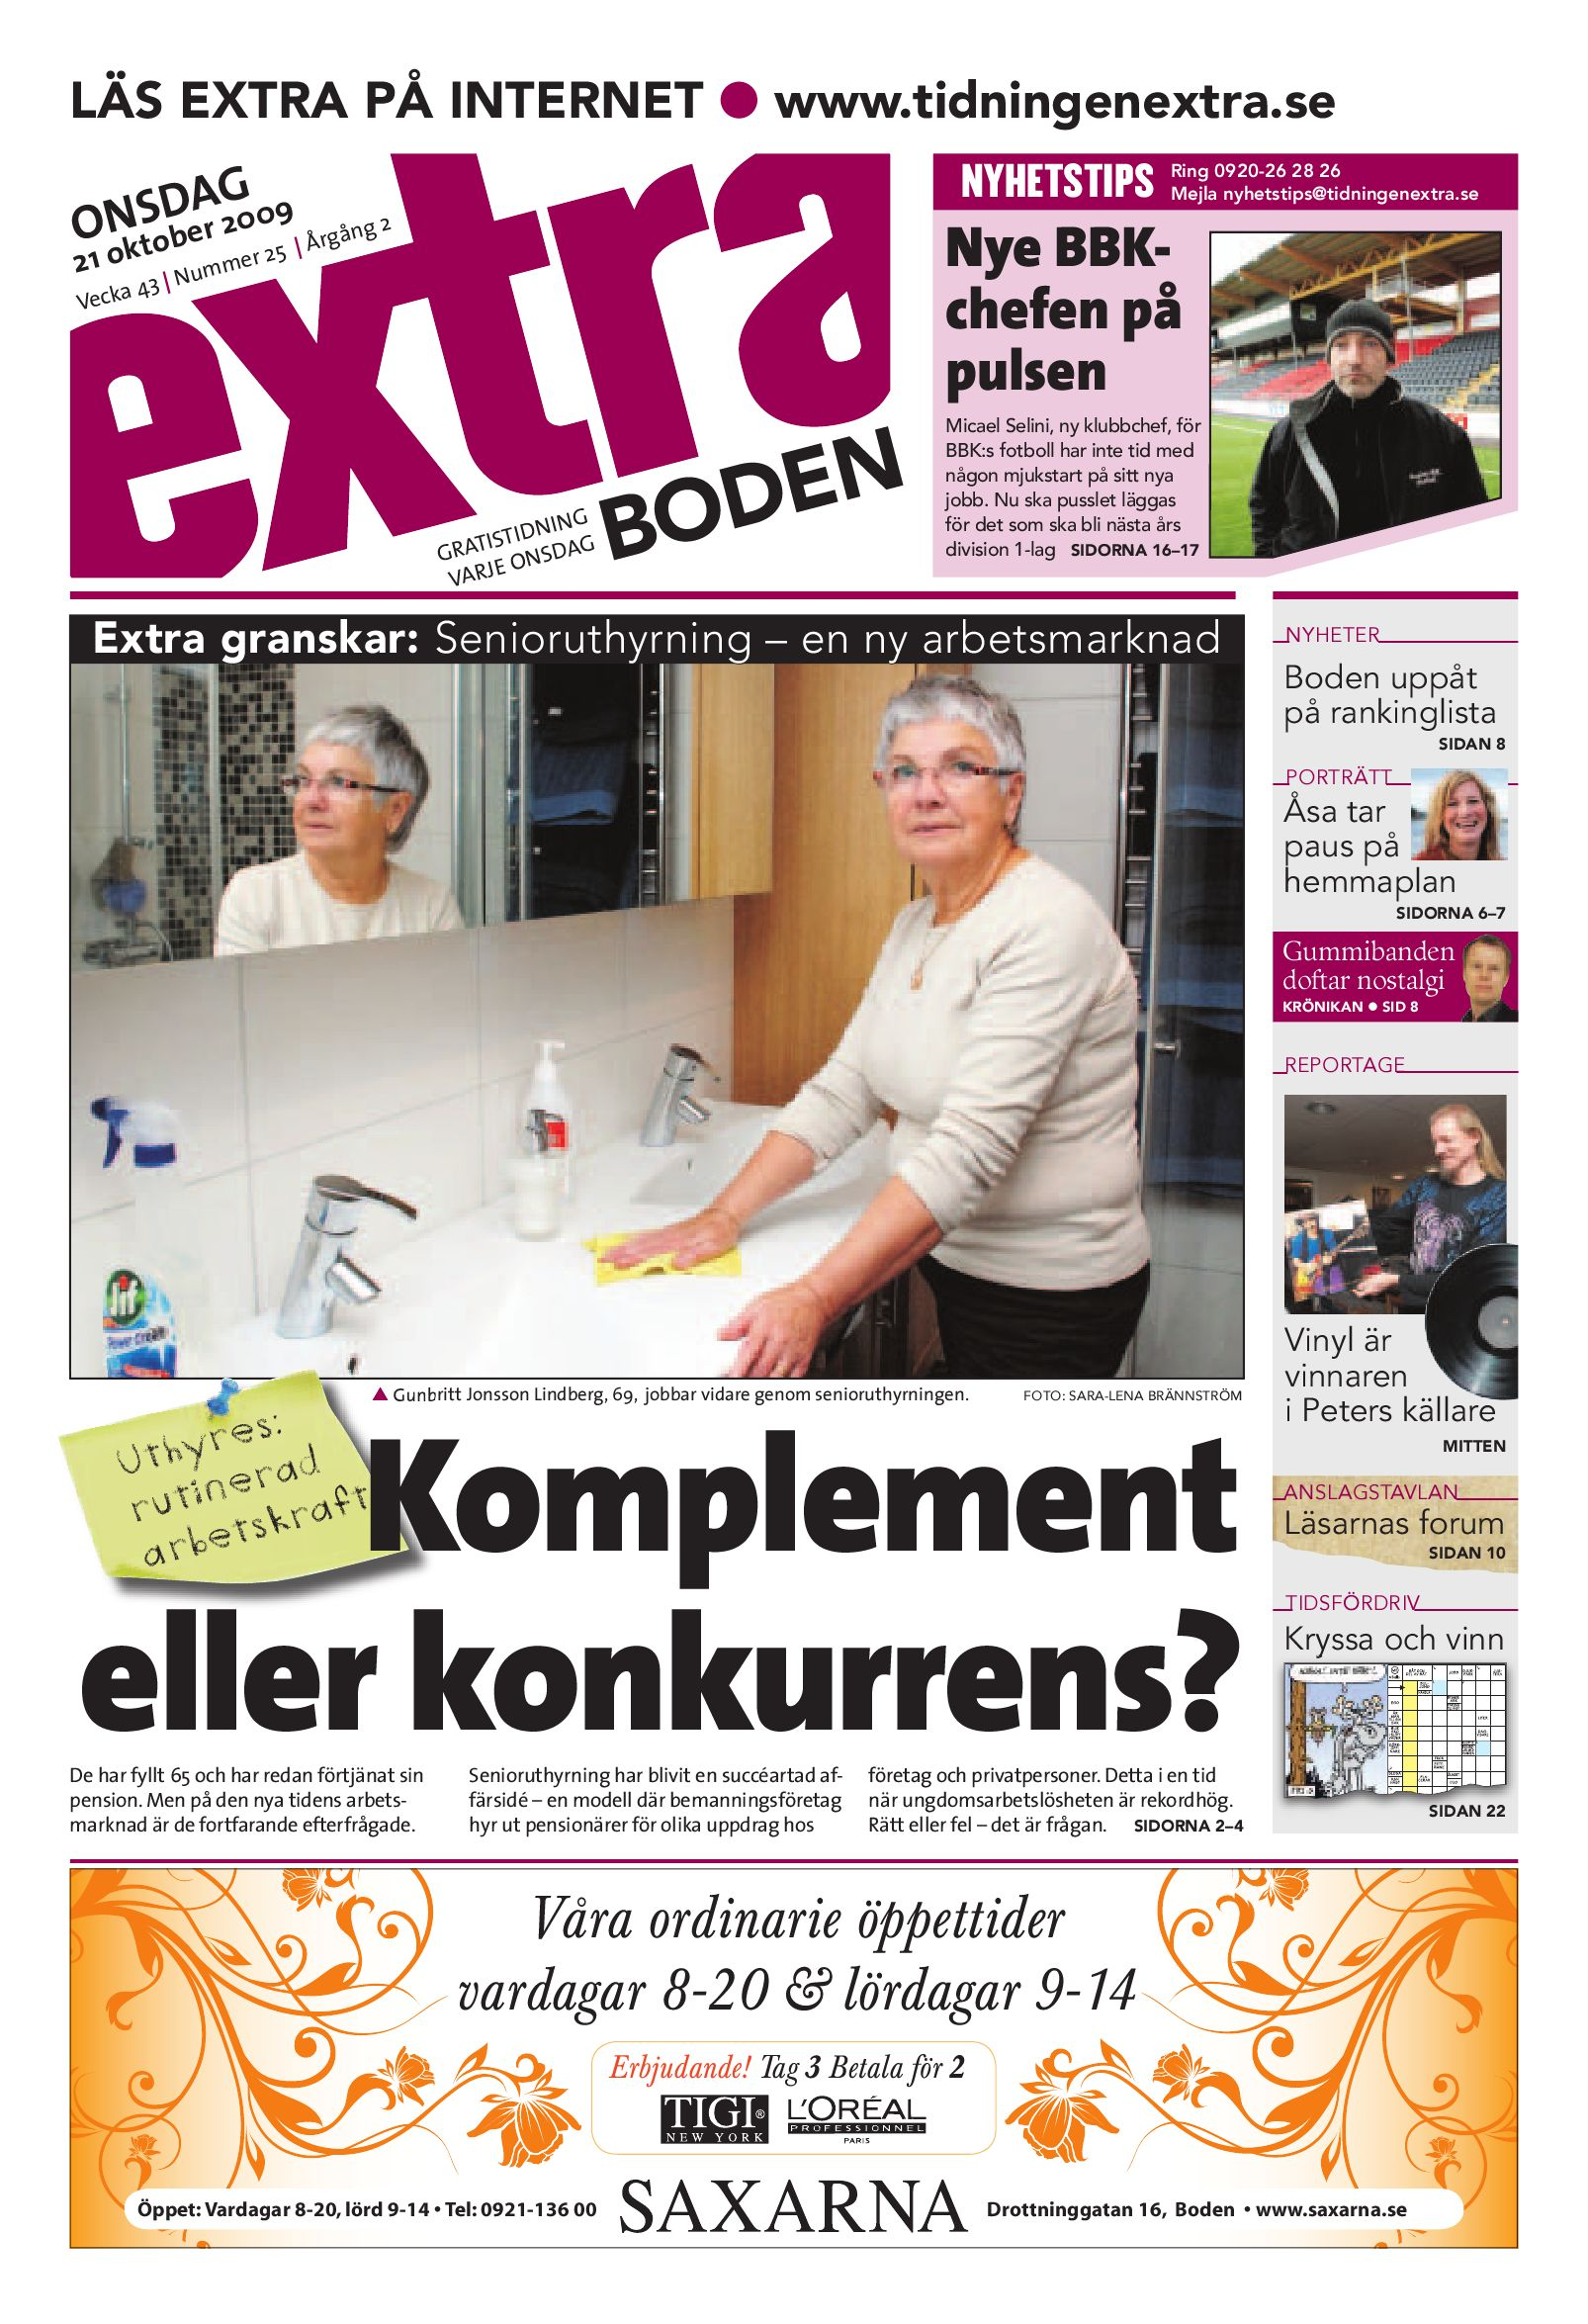 Edeforsvgen 34 Norrbottens Ln, Harads - satisfaction-survey.net